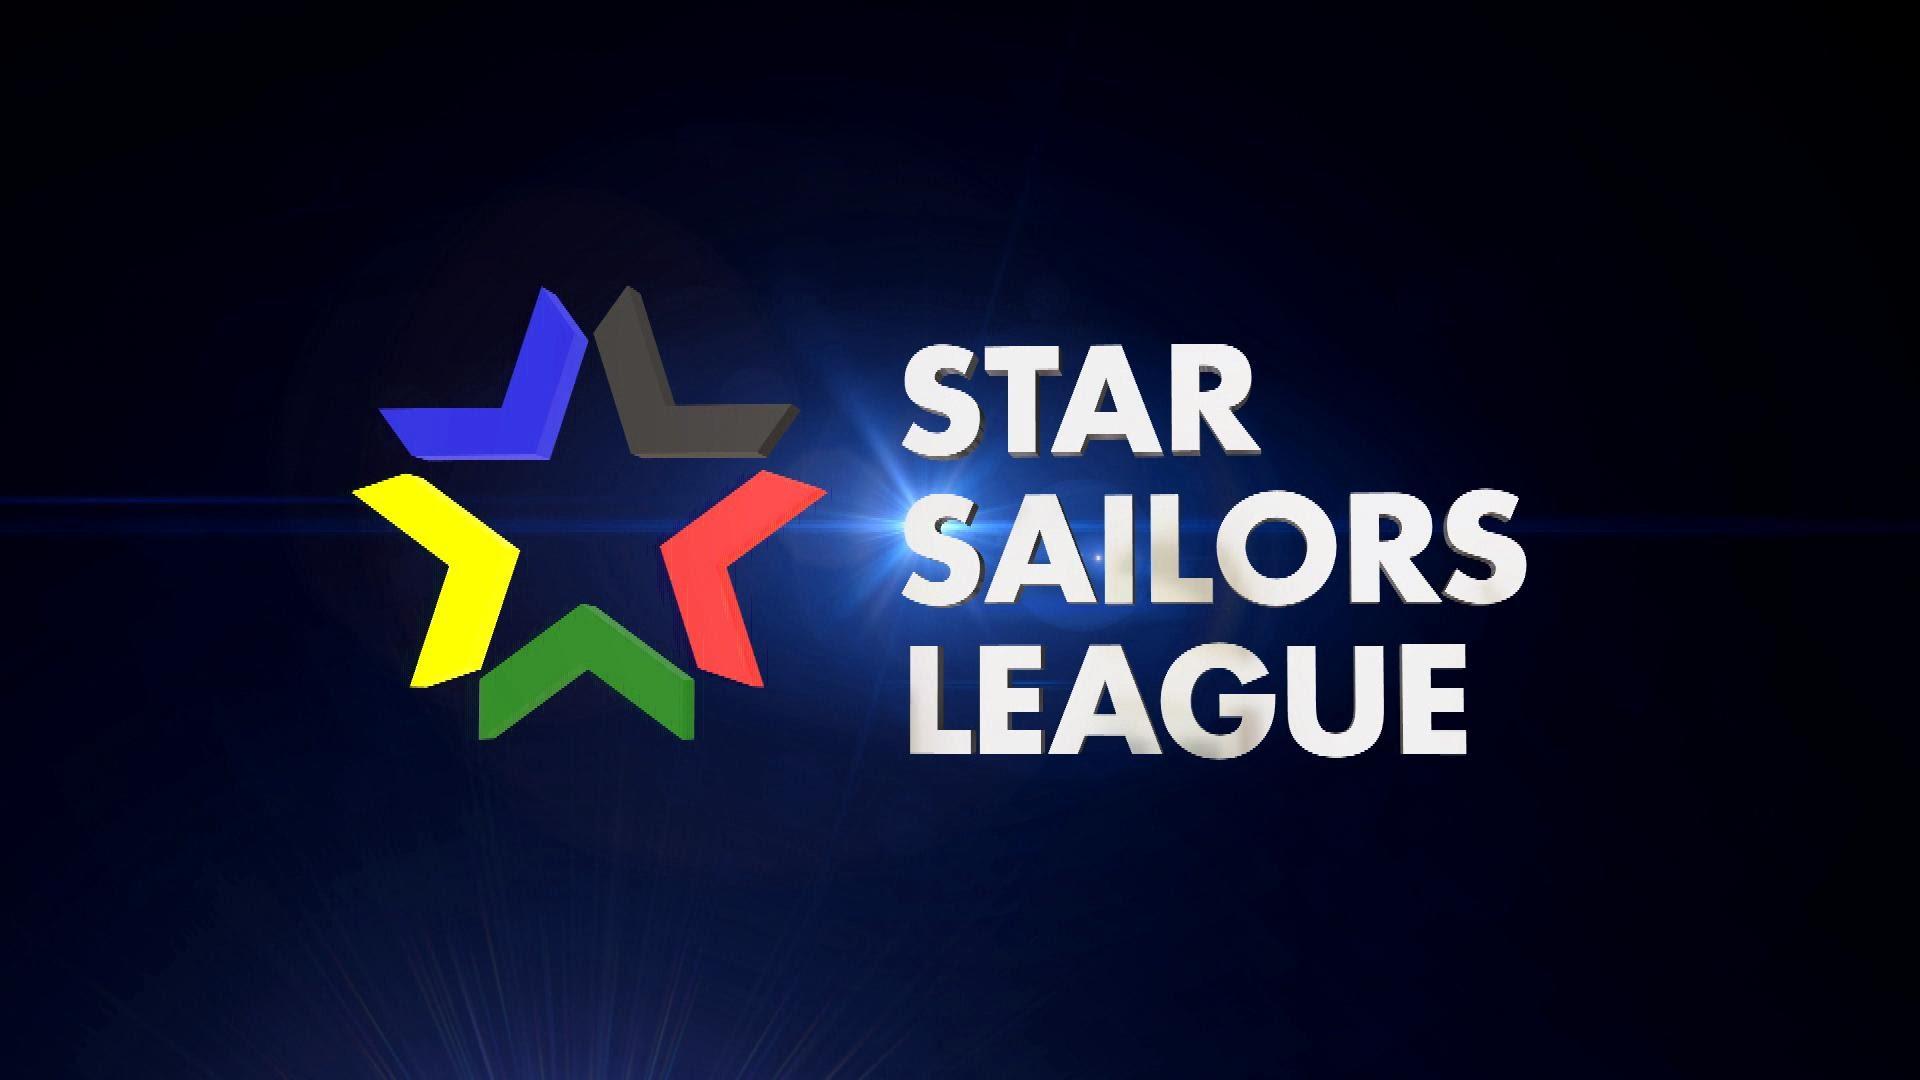 Sport : Stars Sailors League - Race 7 Day 3